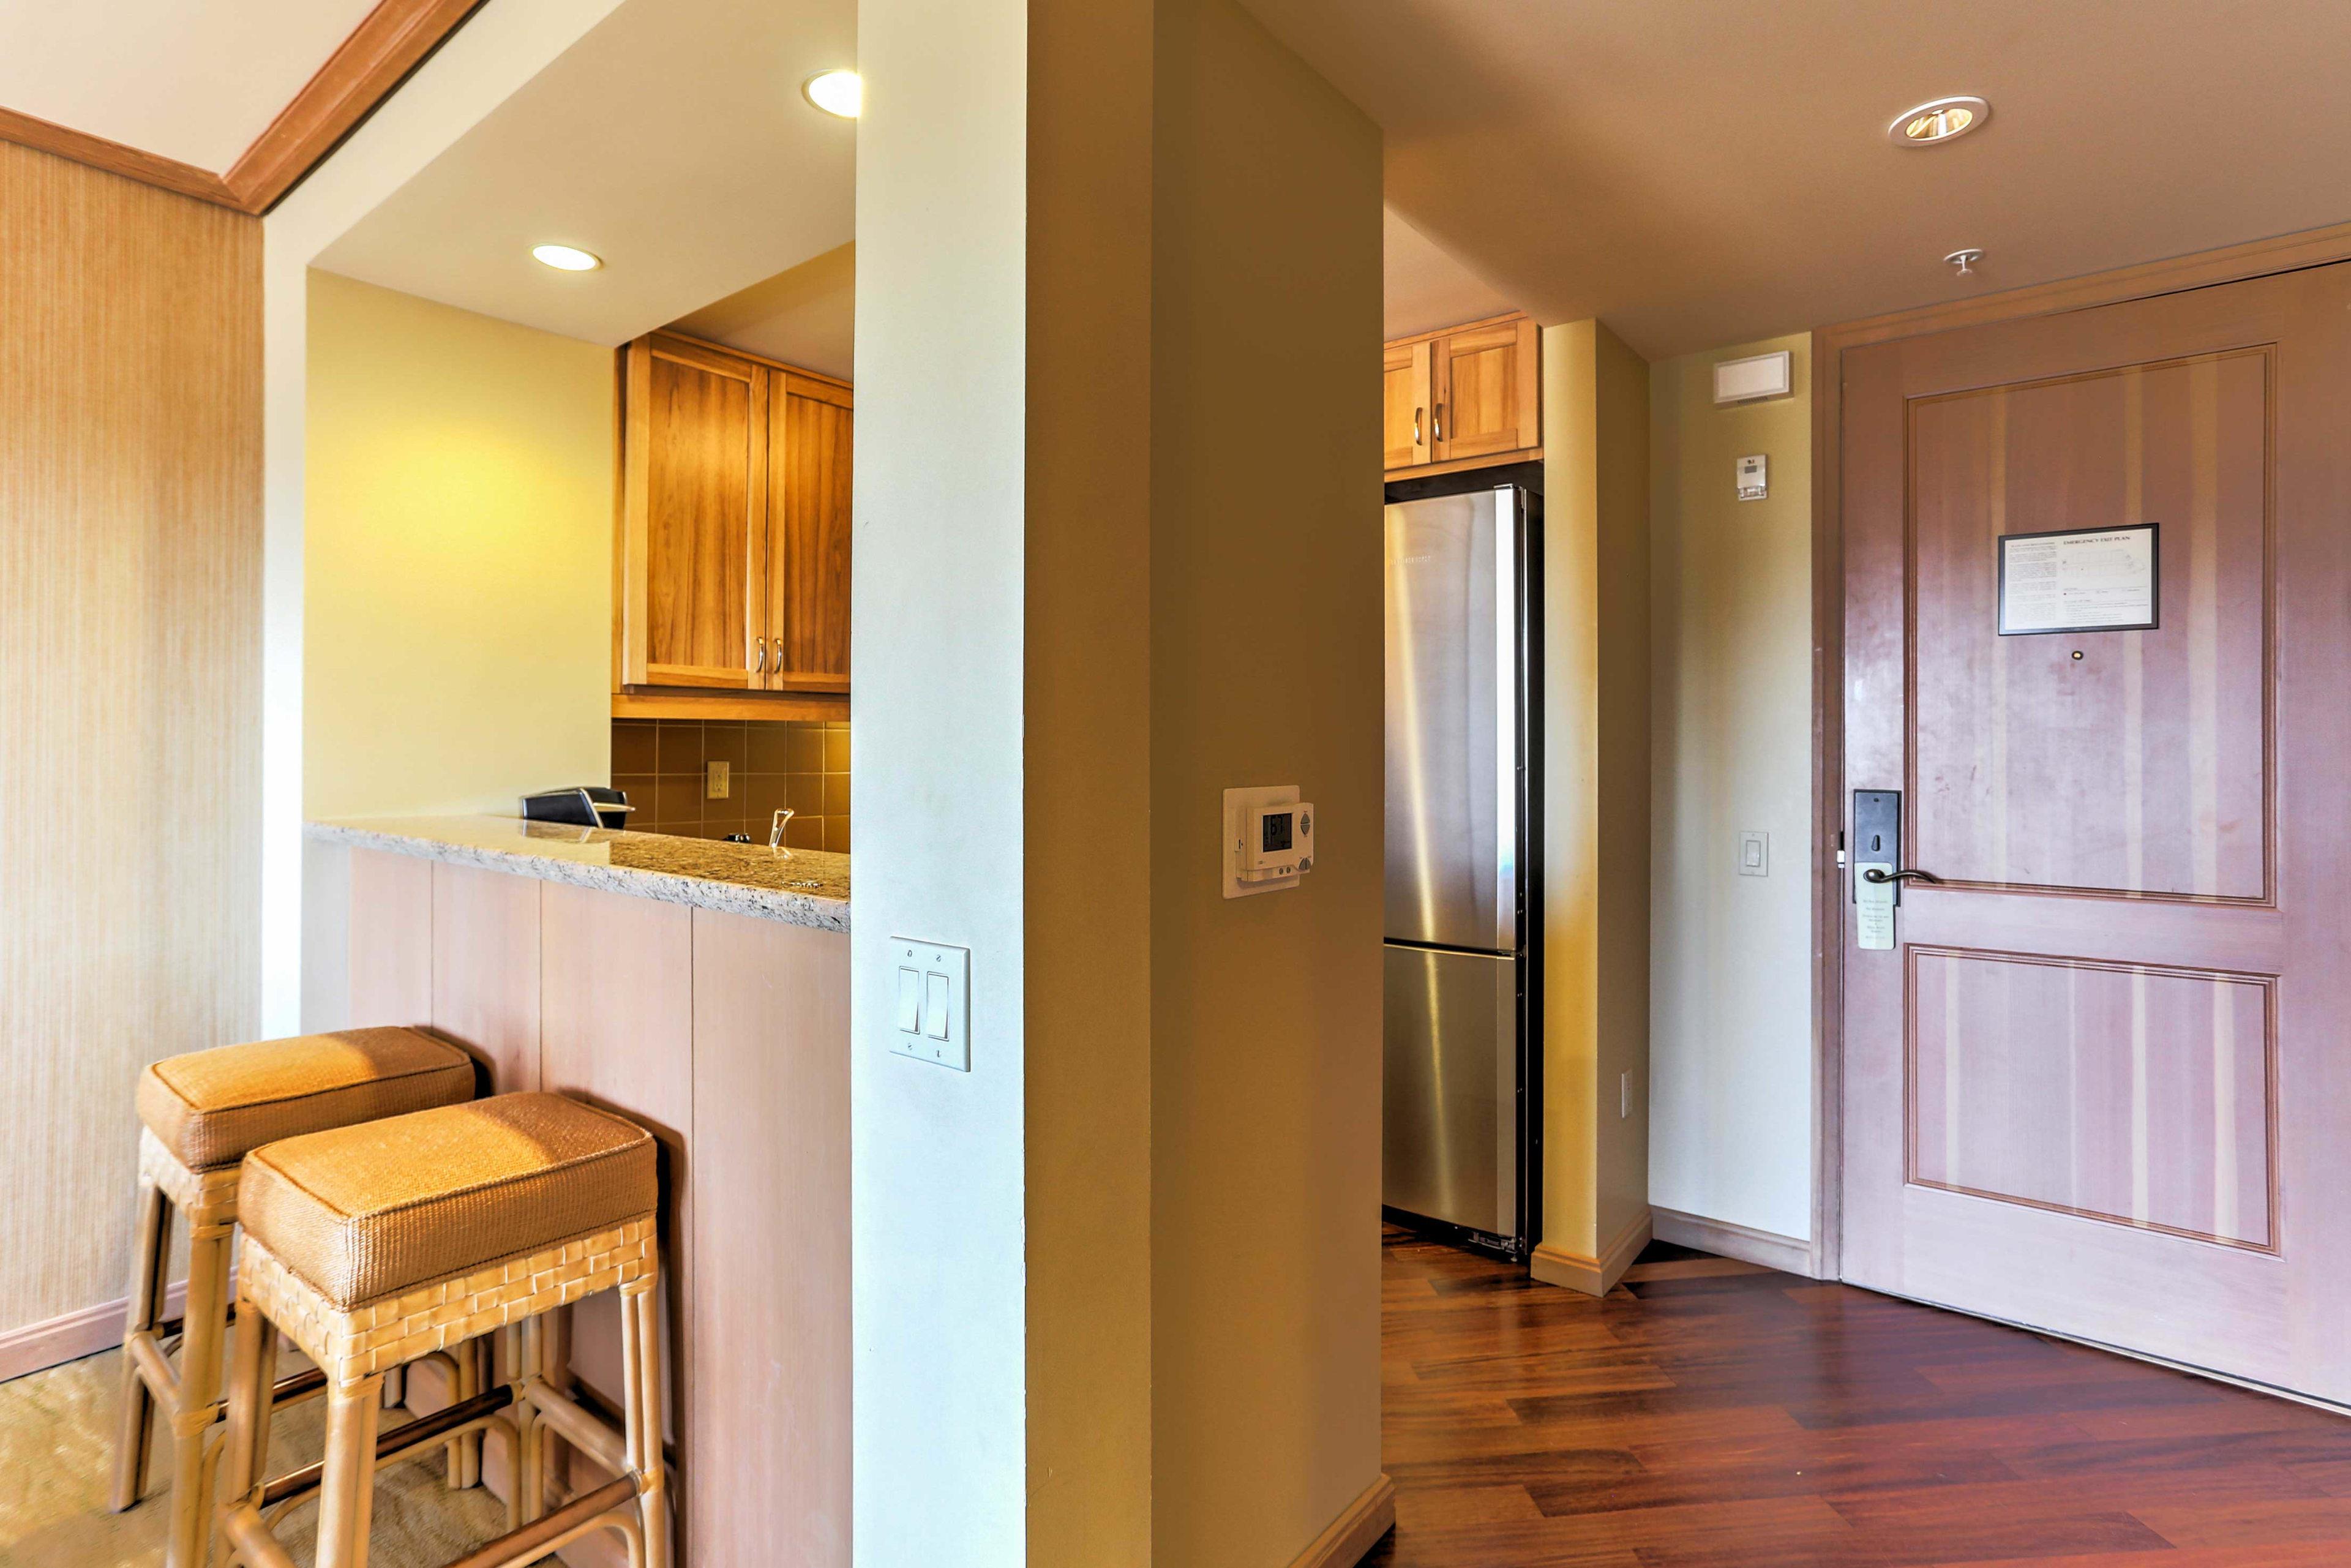 This 1-bedroom, 1-bathroom condo is in the beautiful Suncadia Resort.